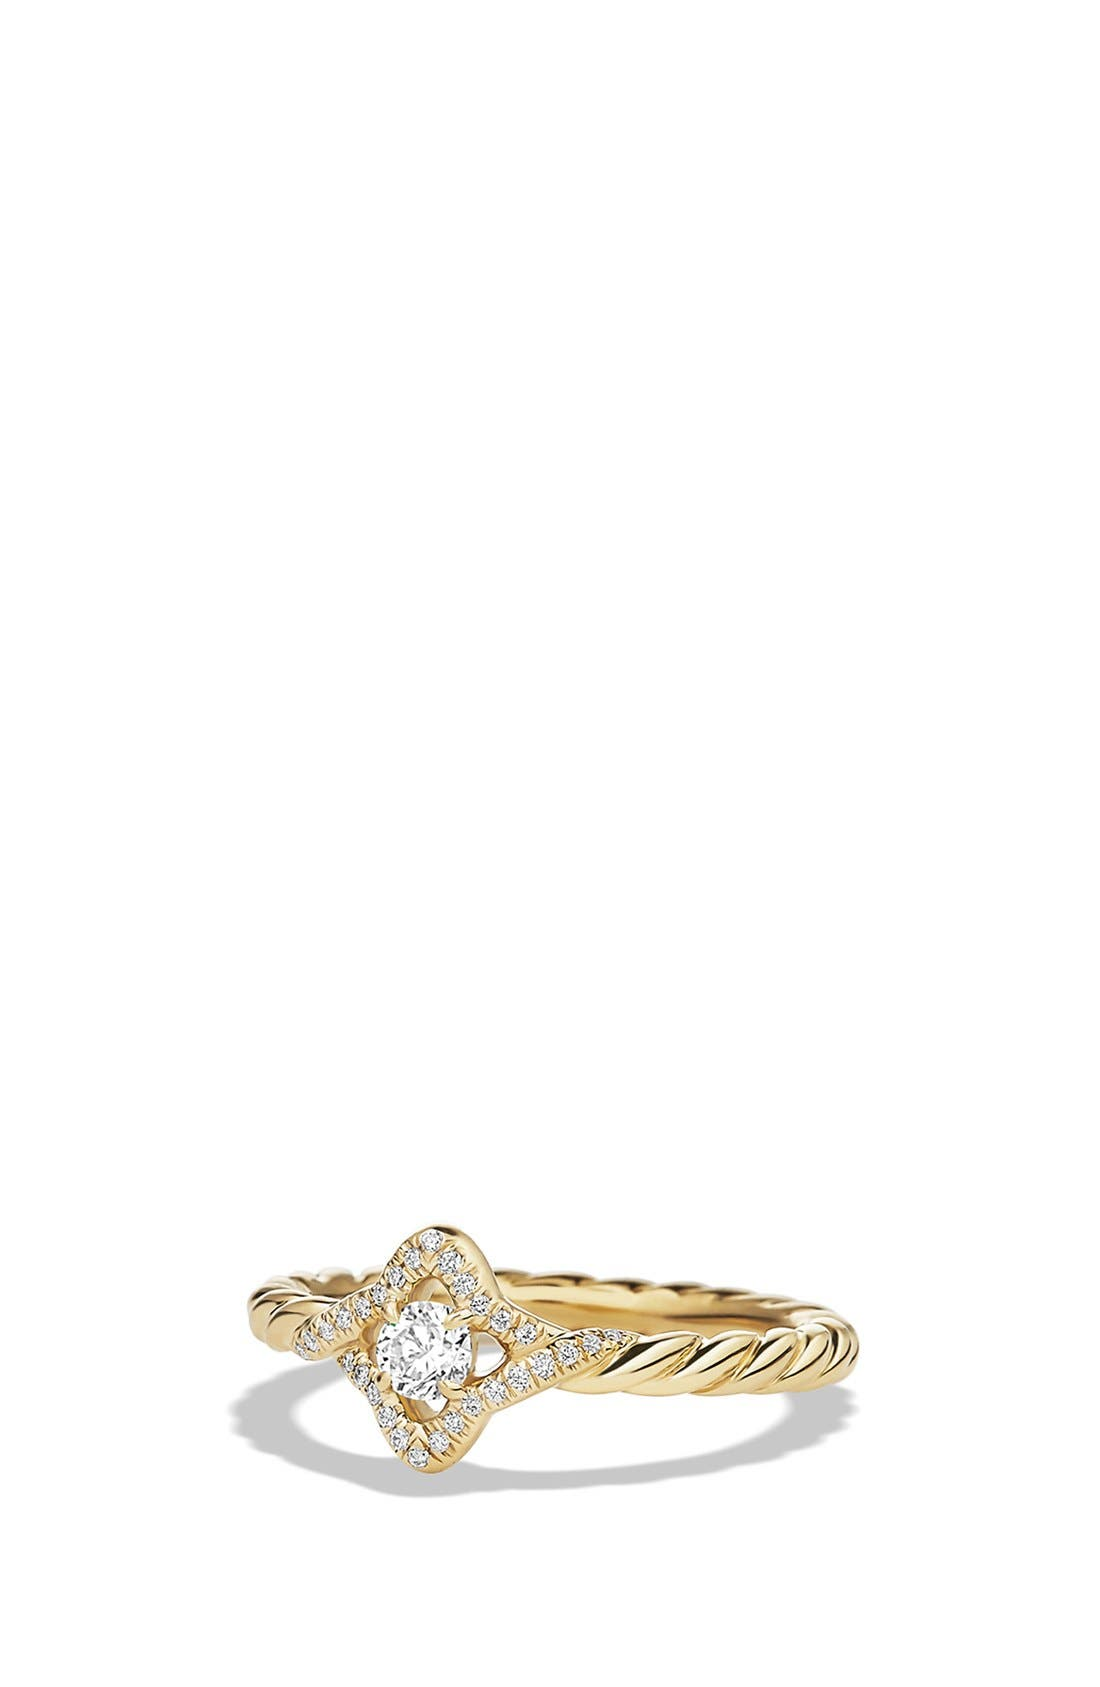 'Venetian Quatrefoil' Ring with Diamonds,                         Main,                         color, YELLOW GOLD